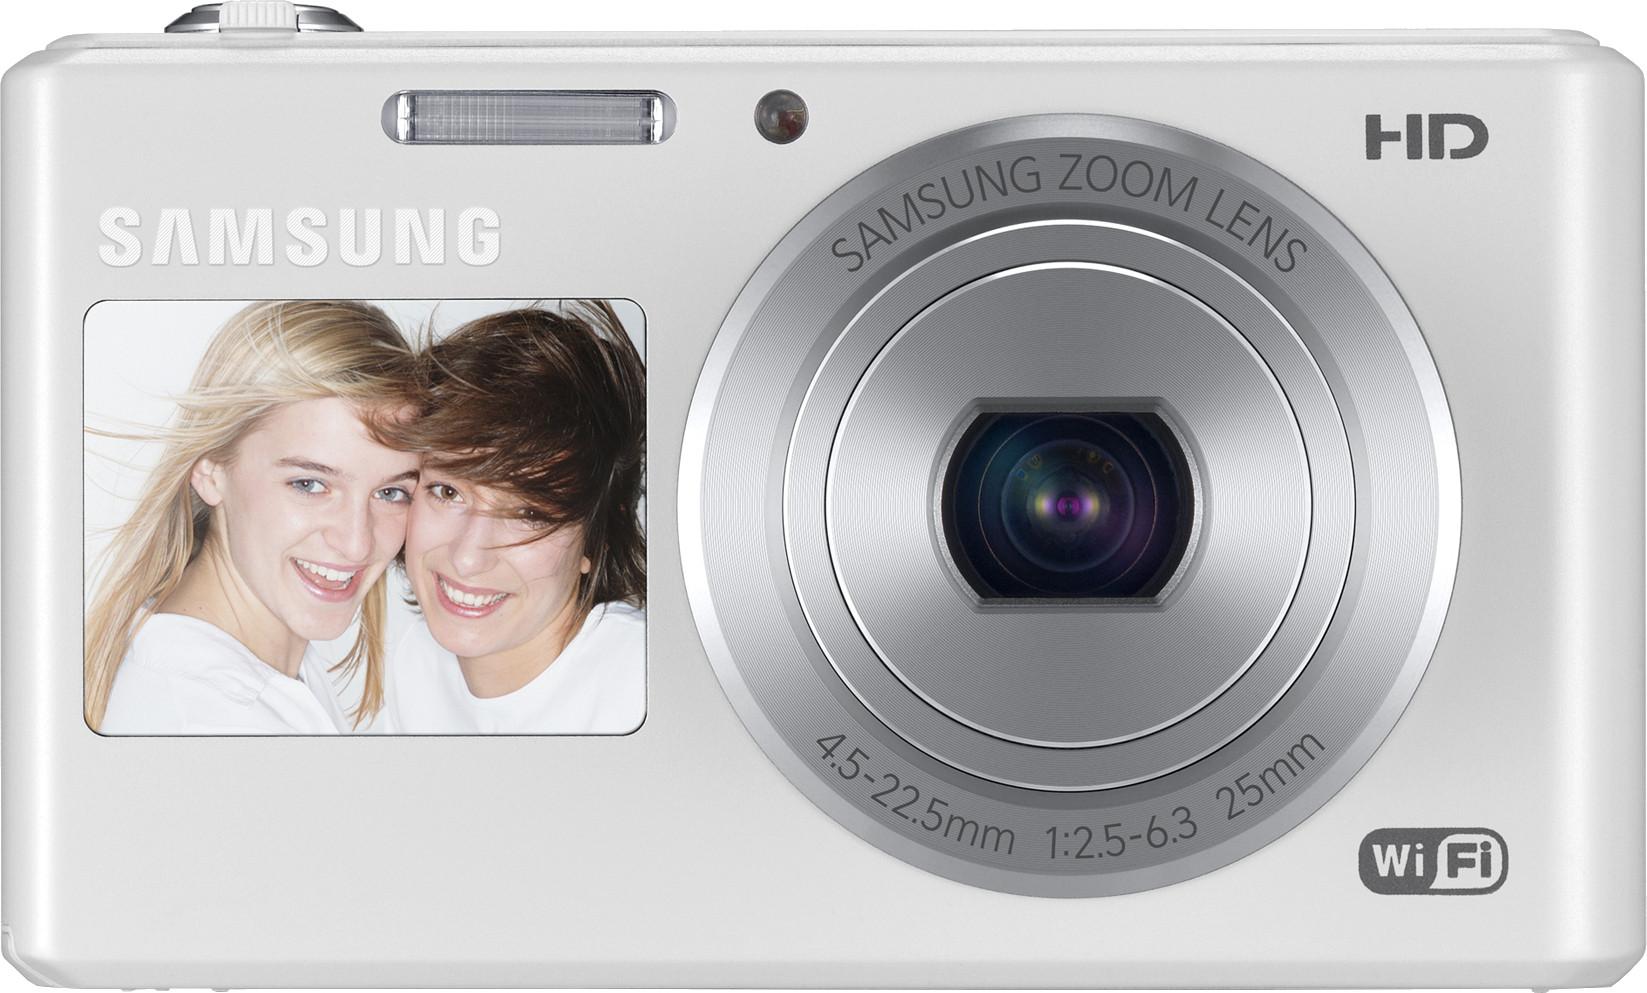 SAMSUNG DV150F Point & Shoot Camera(White)